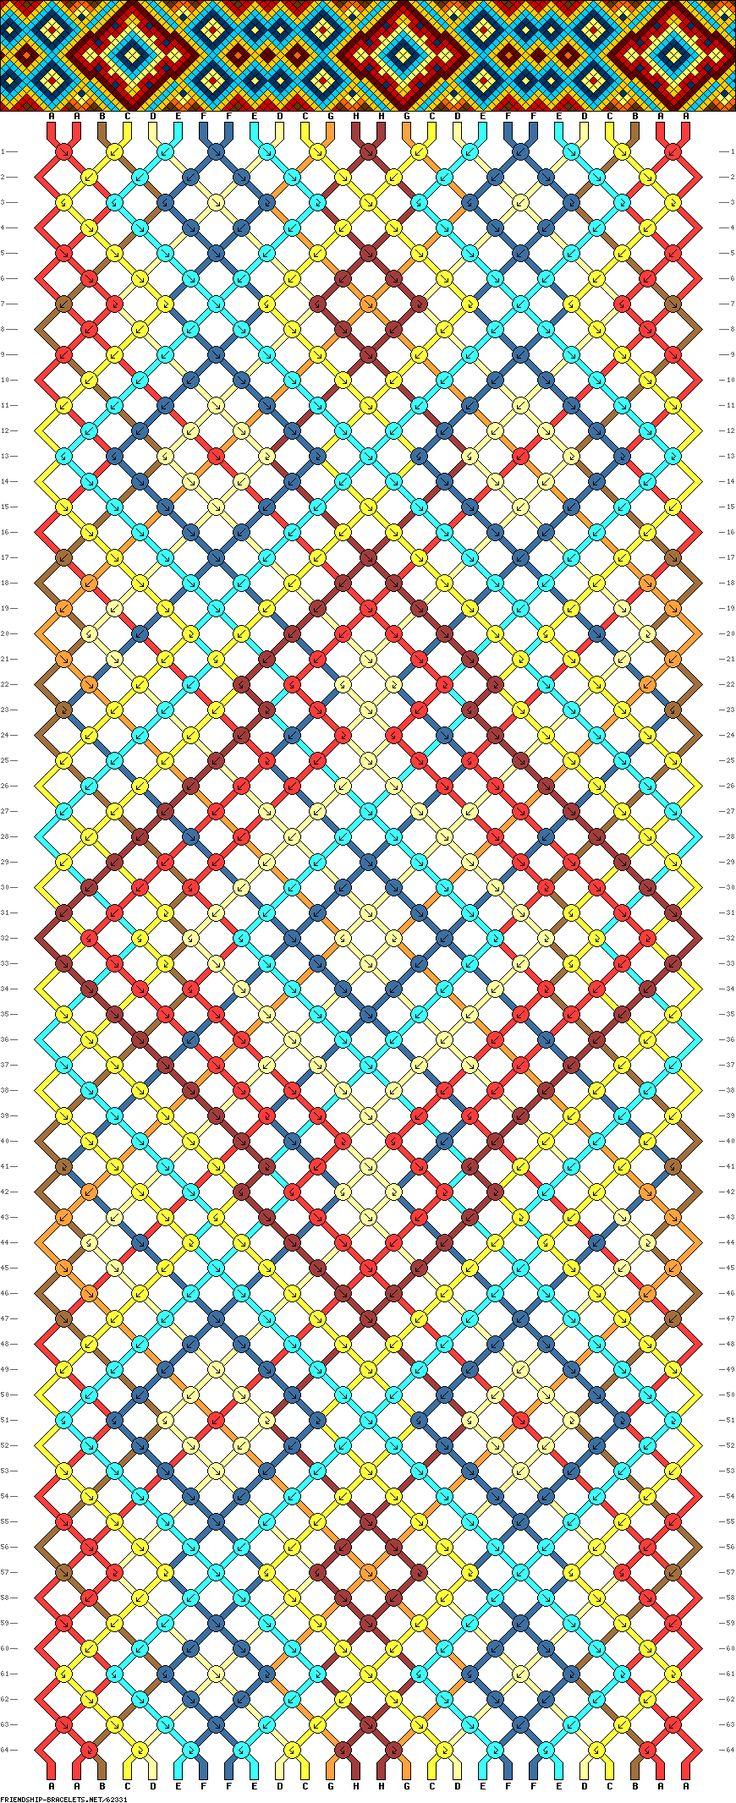 Friendship bracelet pattern - diamonds, squares, stars - 26 strings, 8 colors